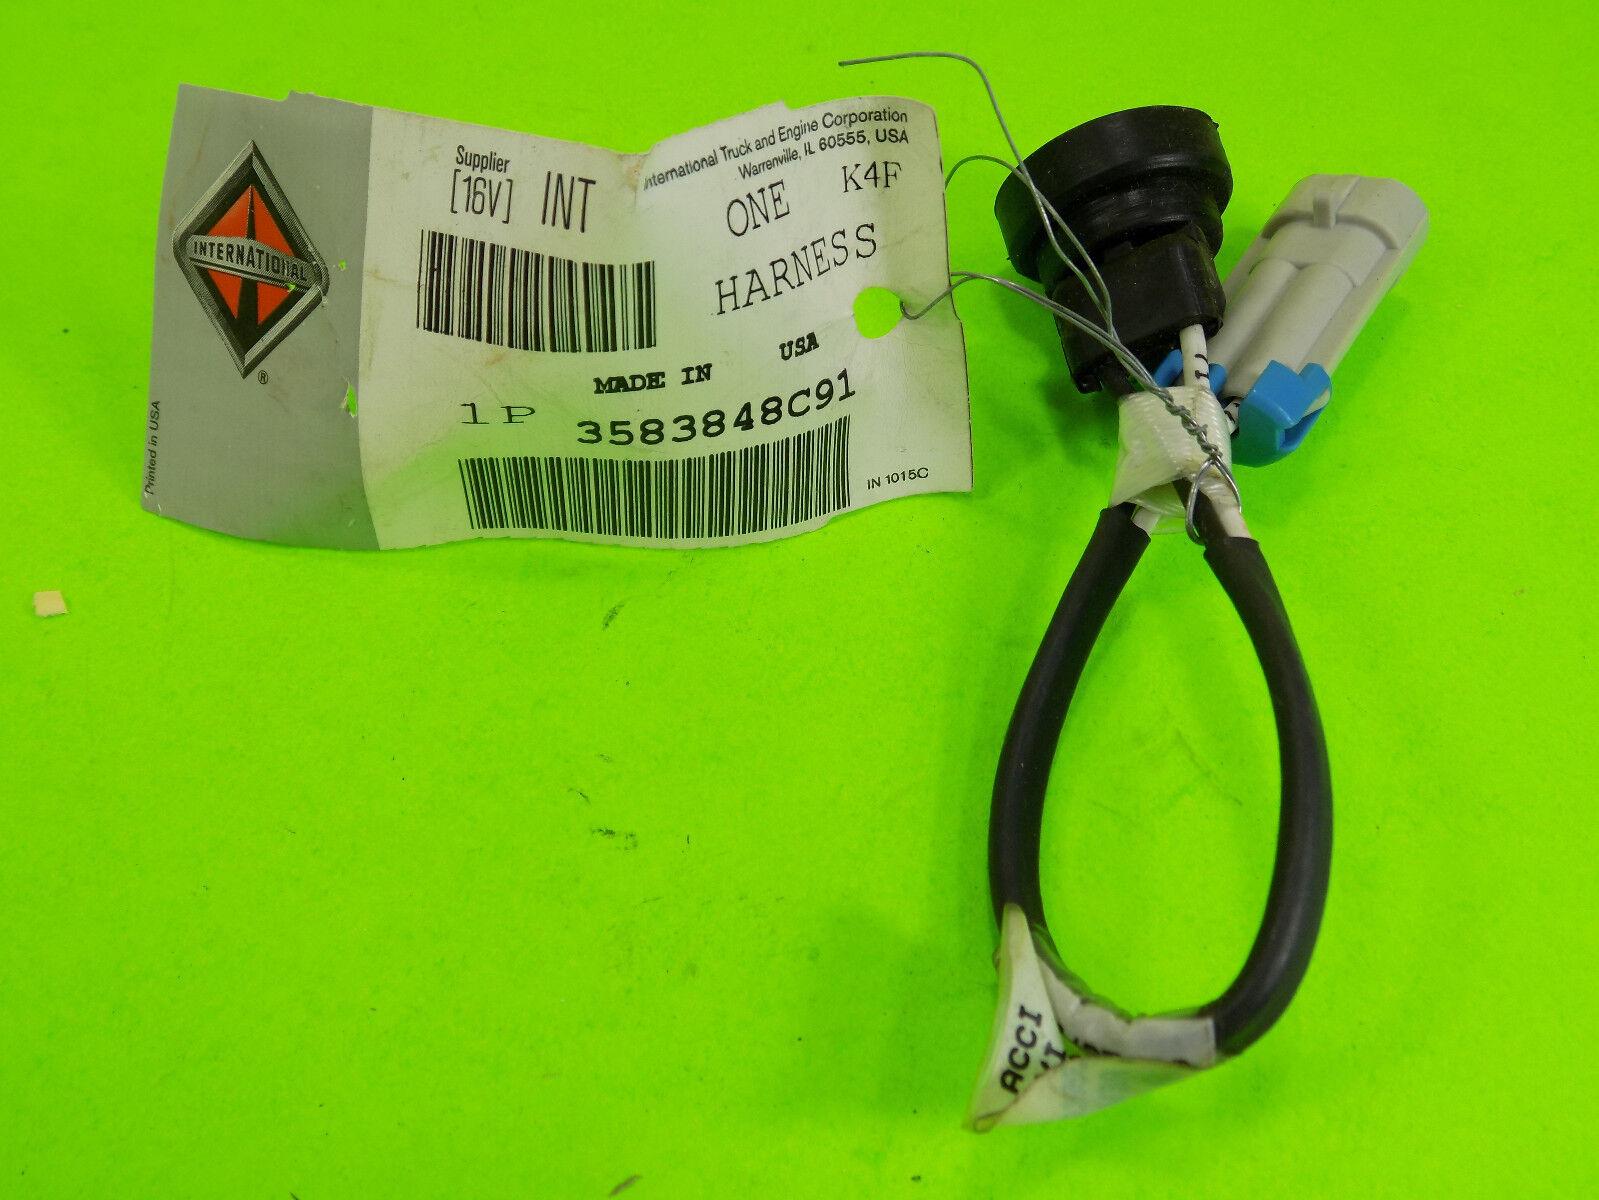 hight resolution of new genuine navistar international harness 3583848c91 18 00